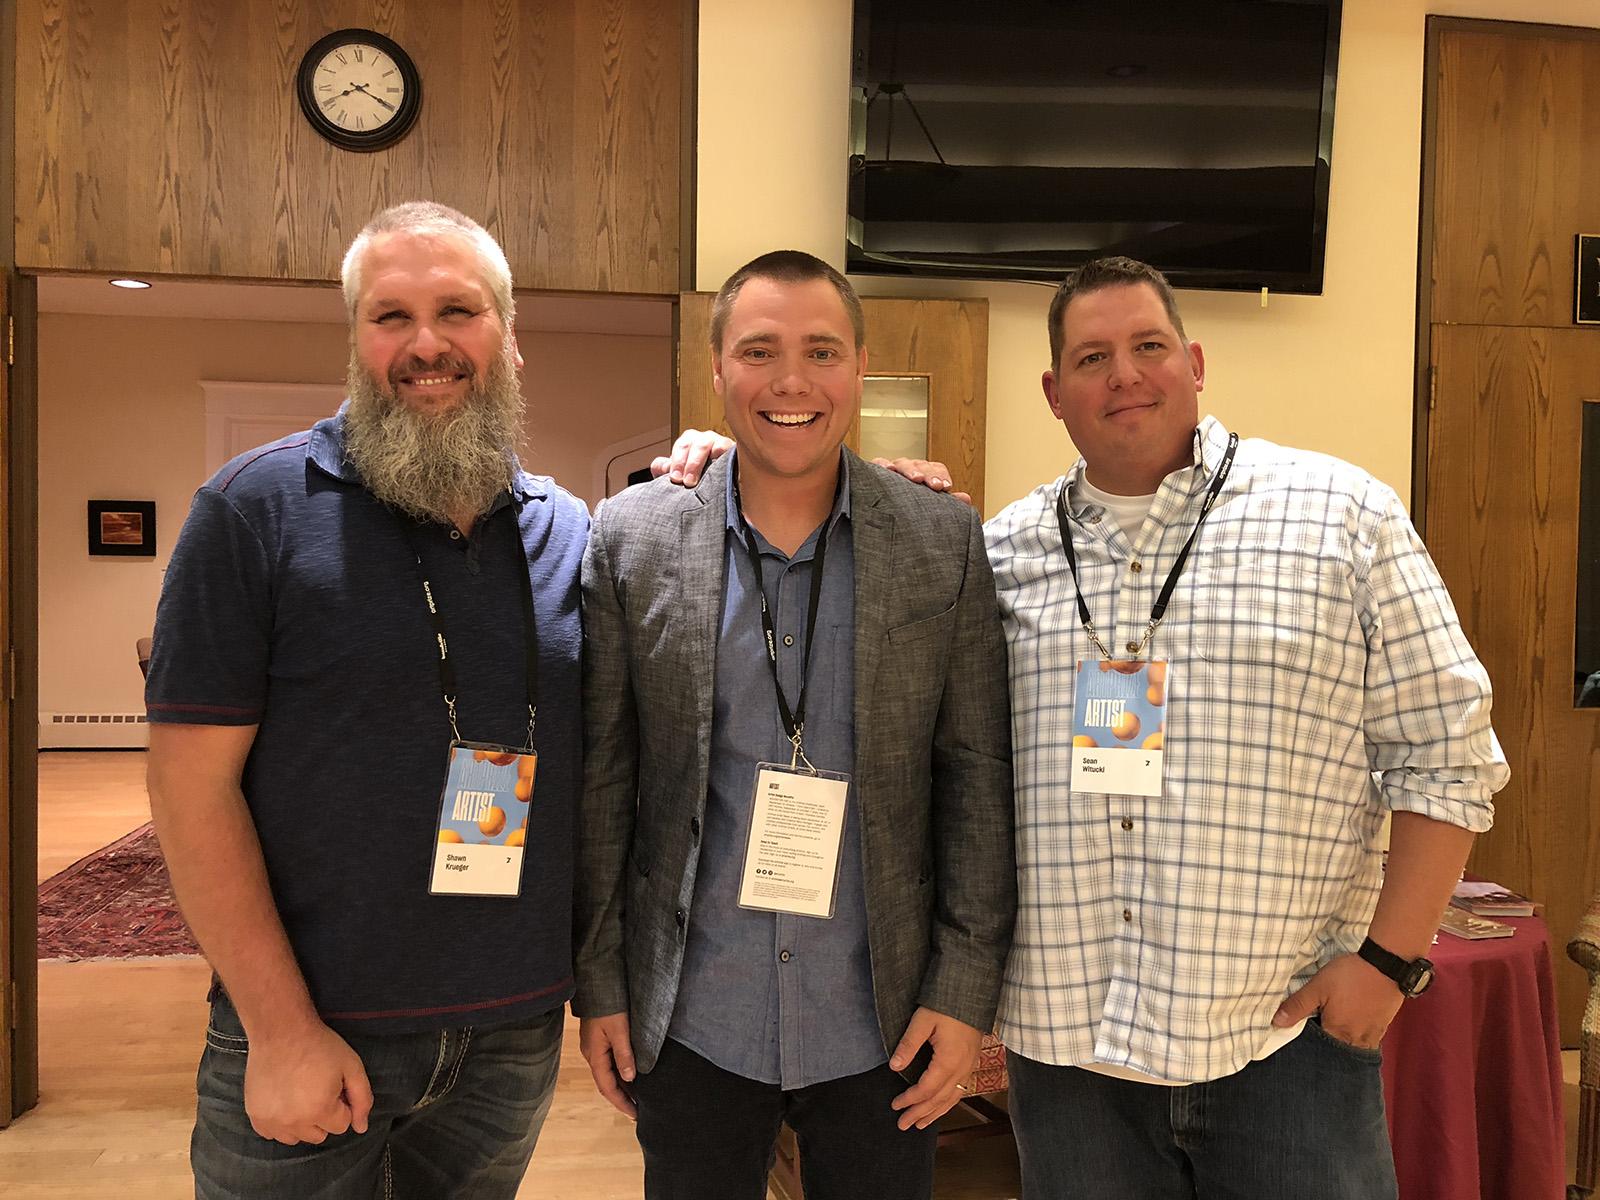 Shawn Krueger, Me, & Sean Witucki